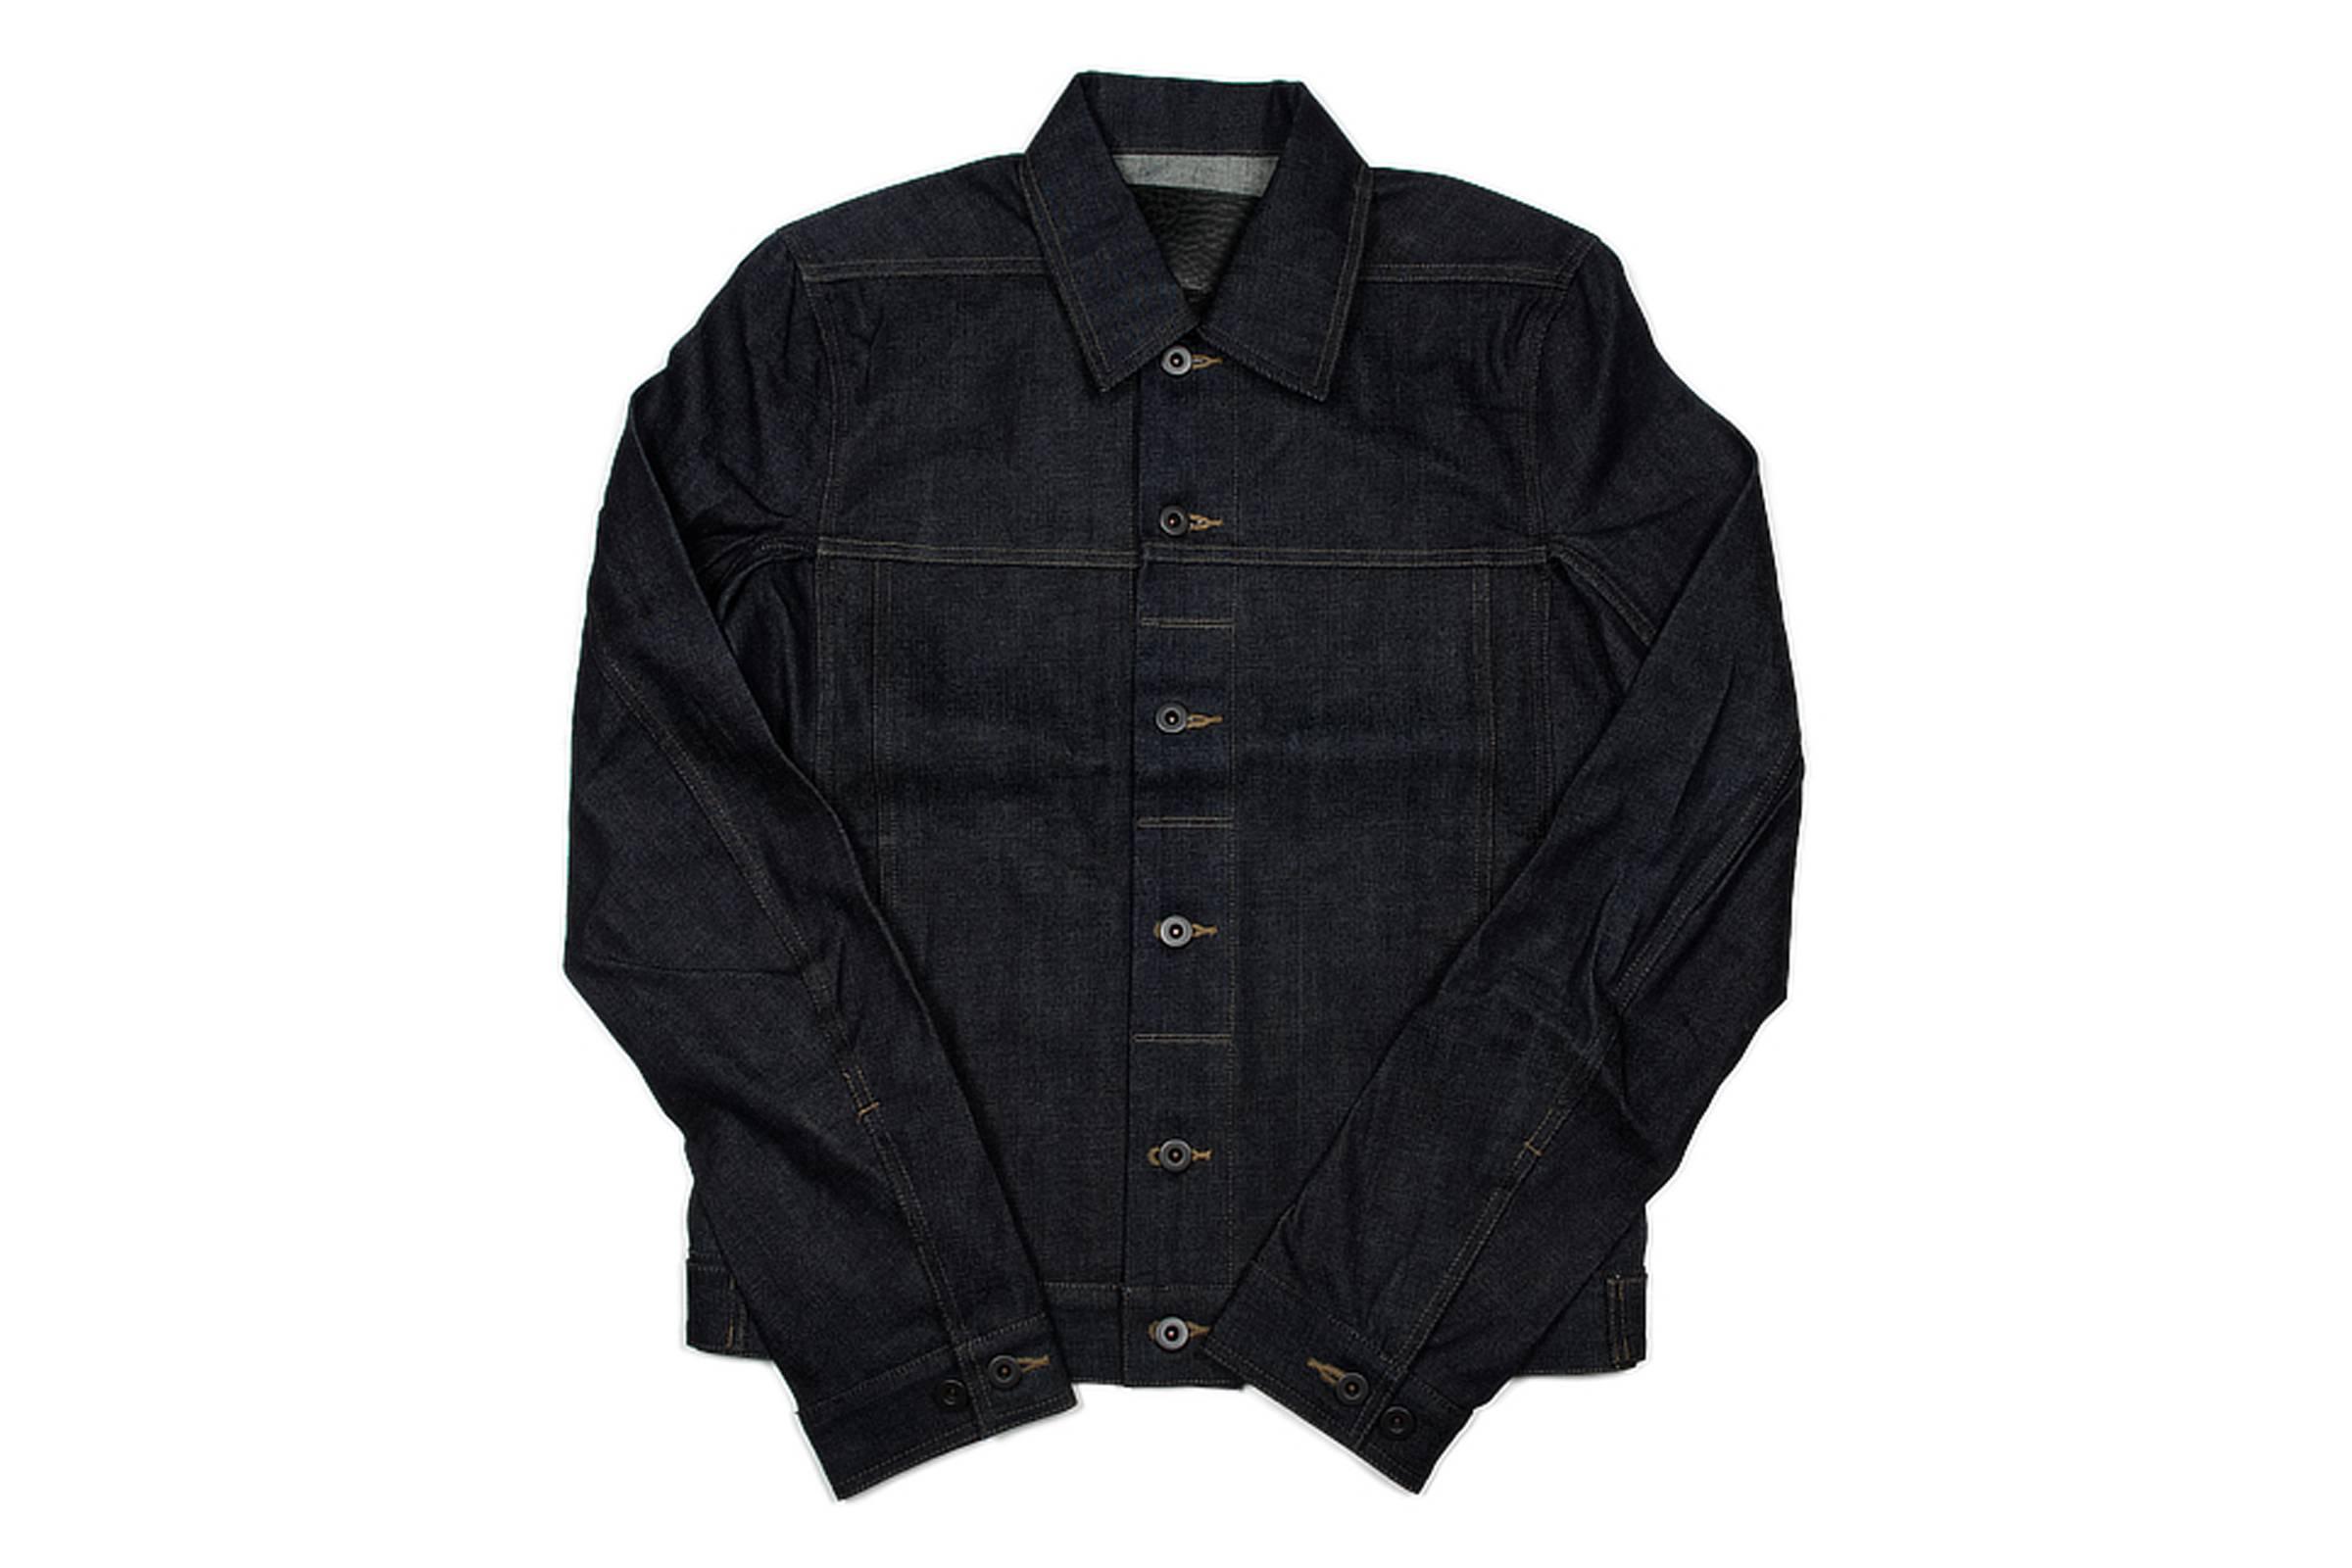 Rick Owens DRKSHDW Worker Jacket